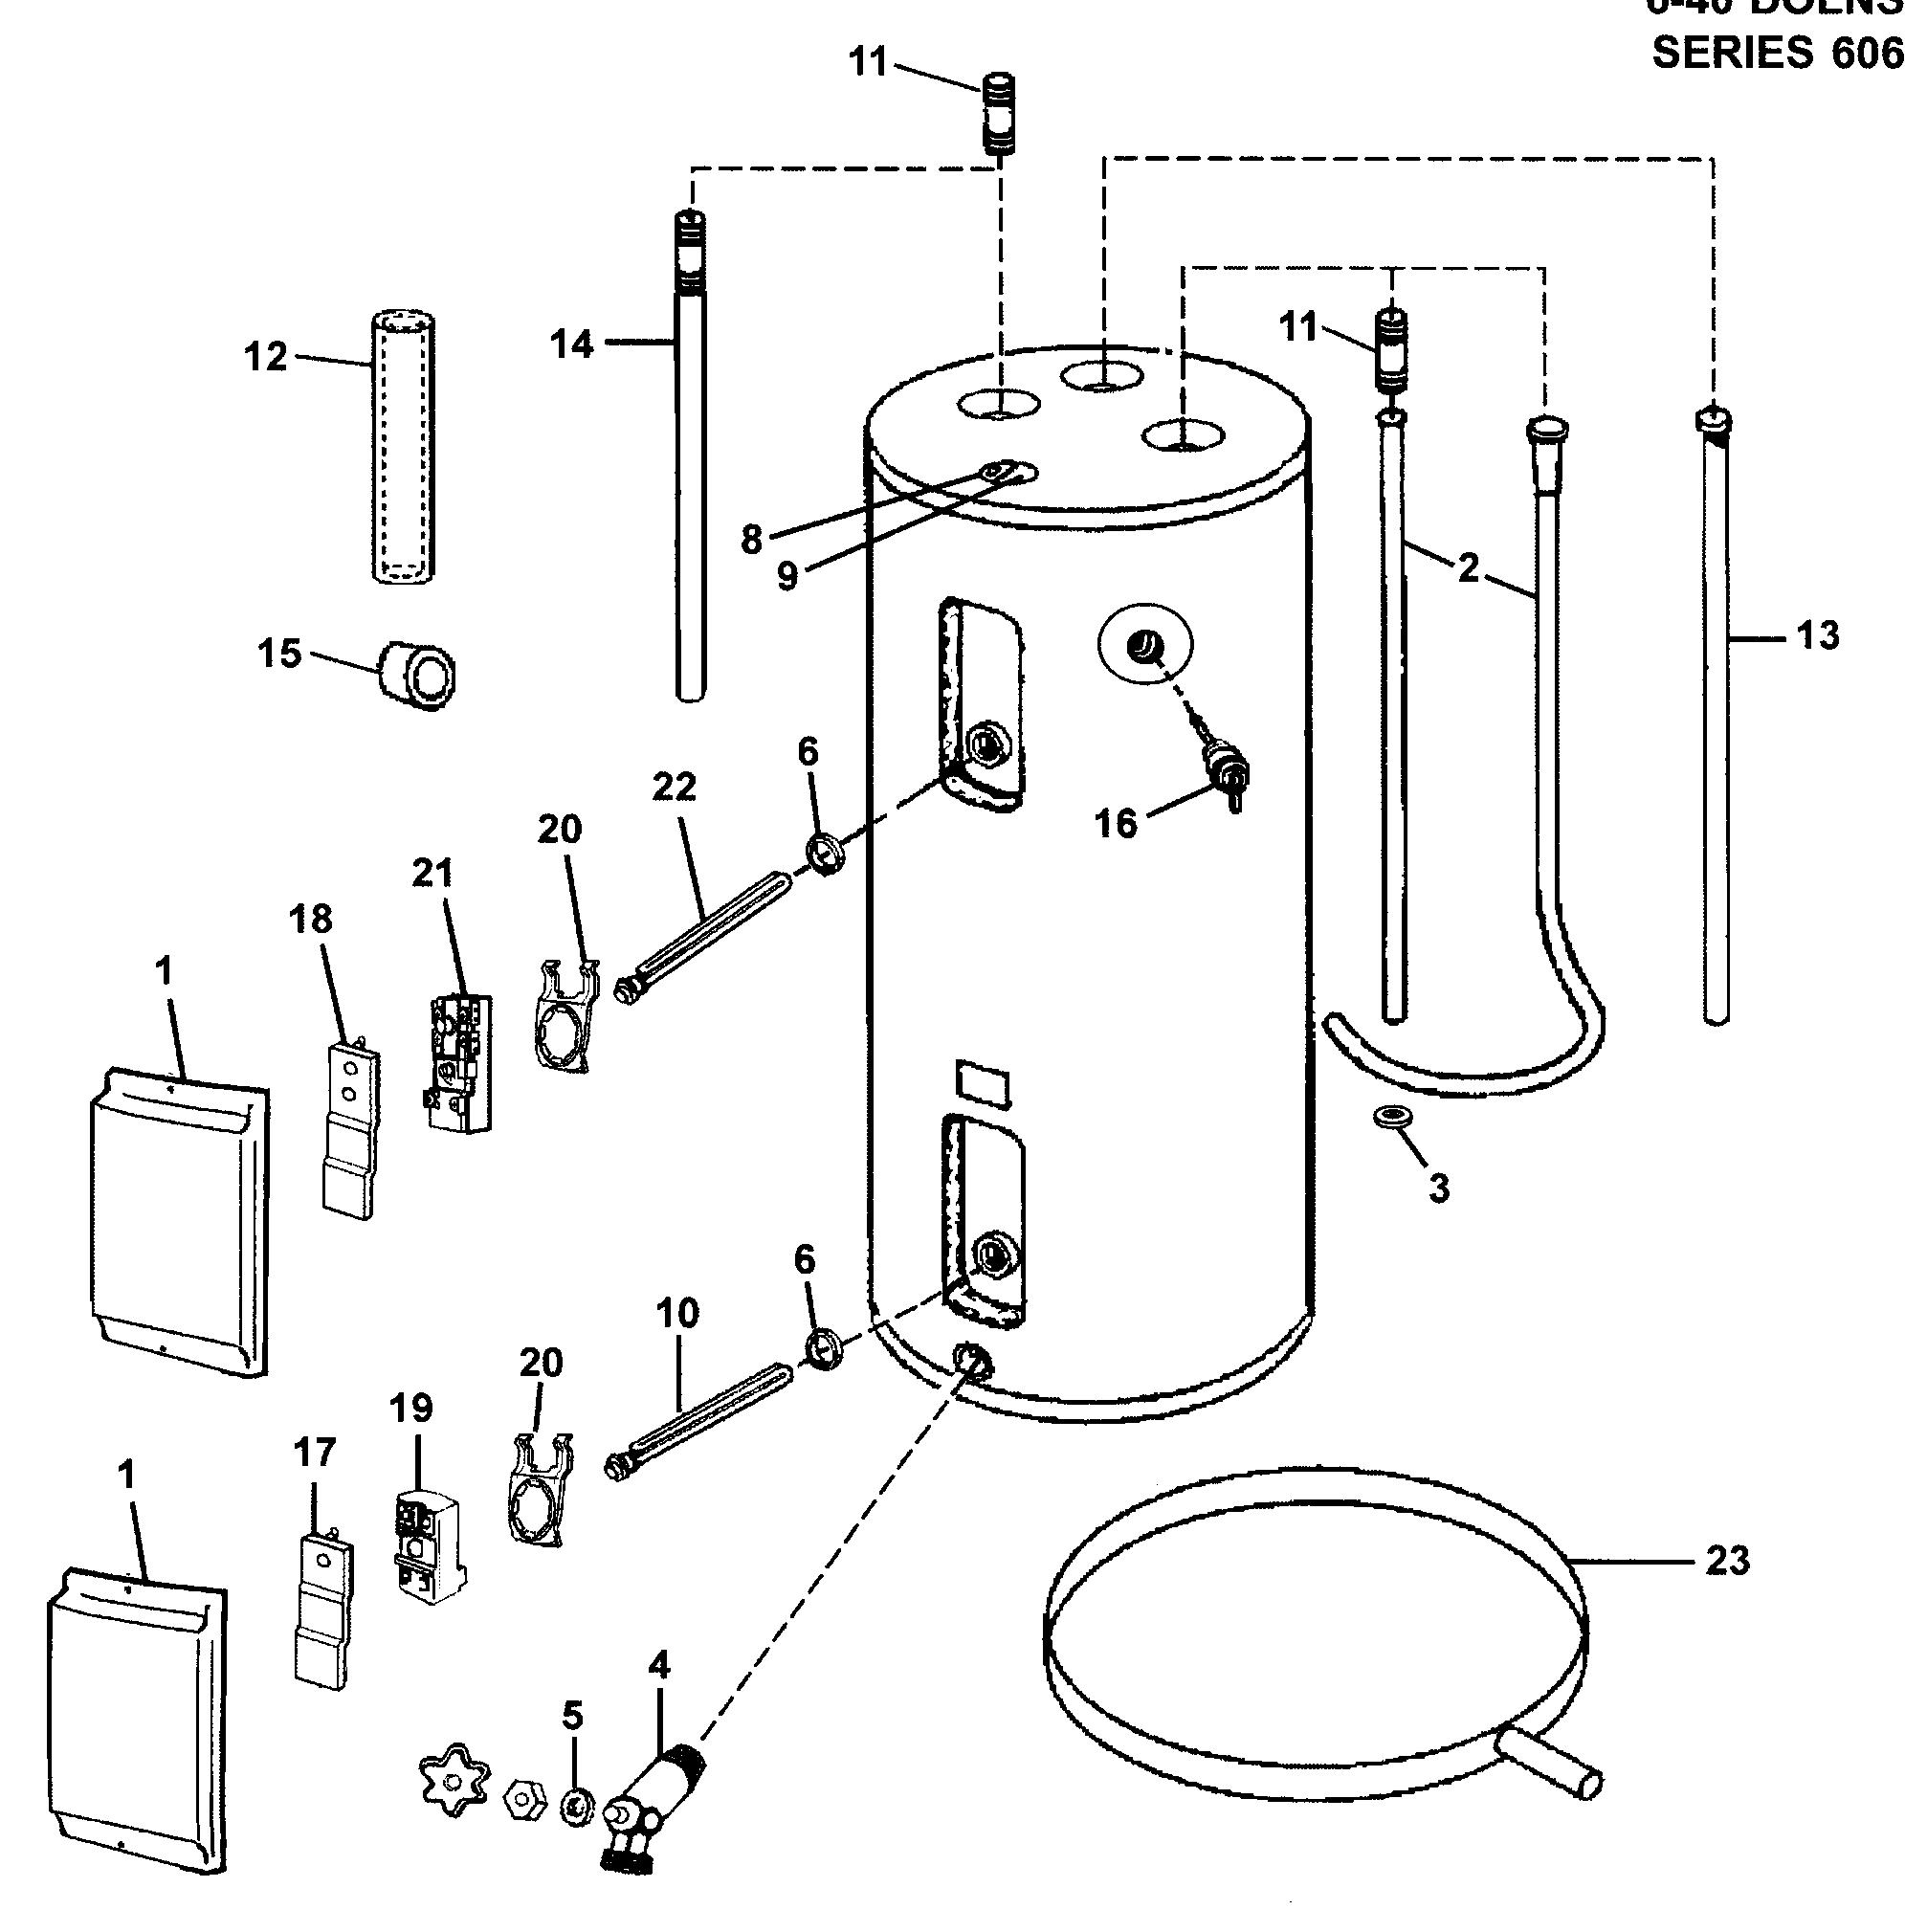 wiring 240v water heater element [ 1991 x 2019 Pixel ]